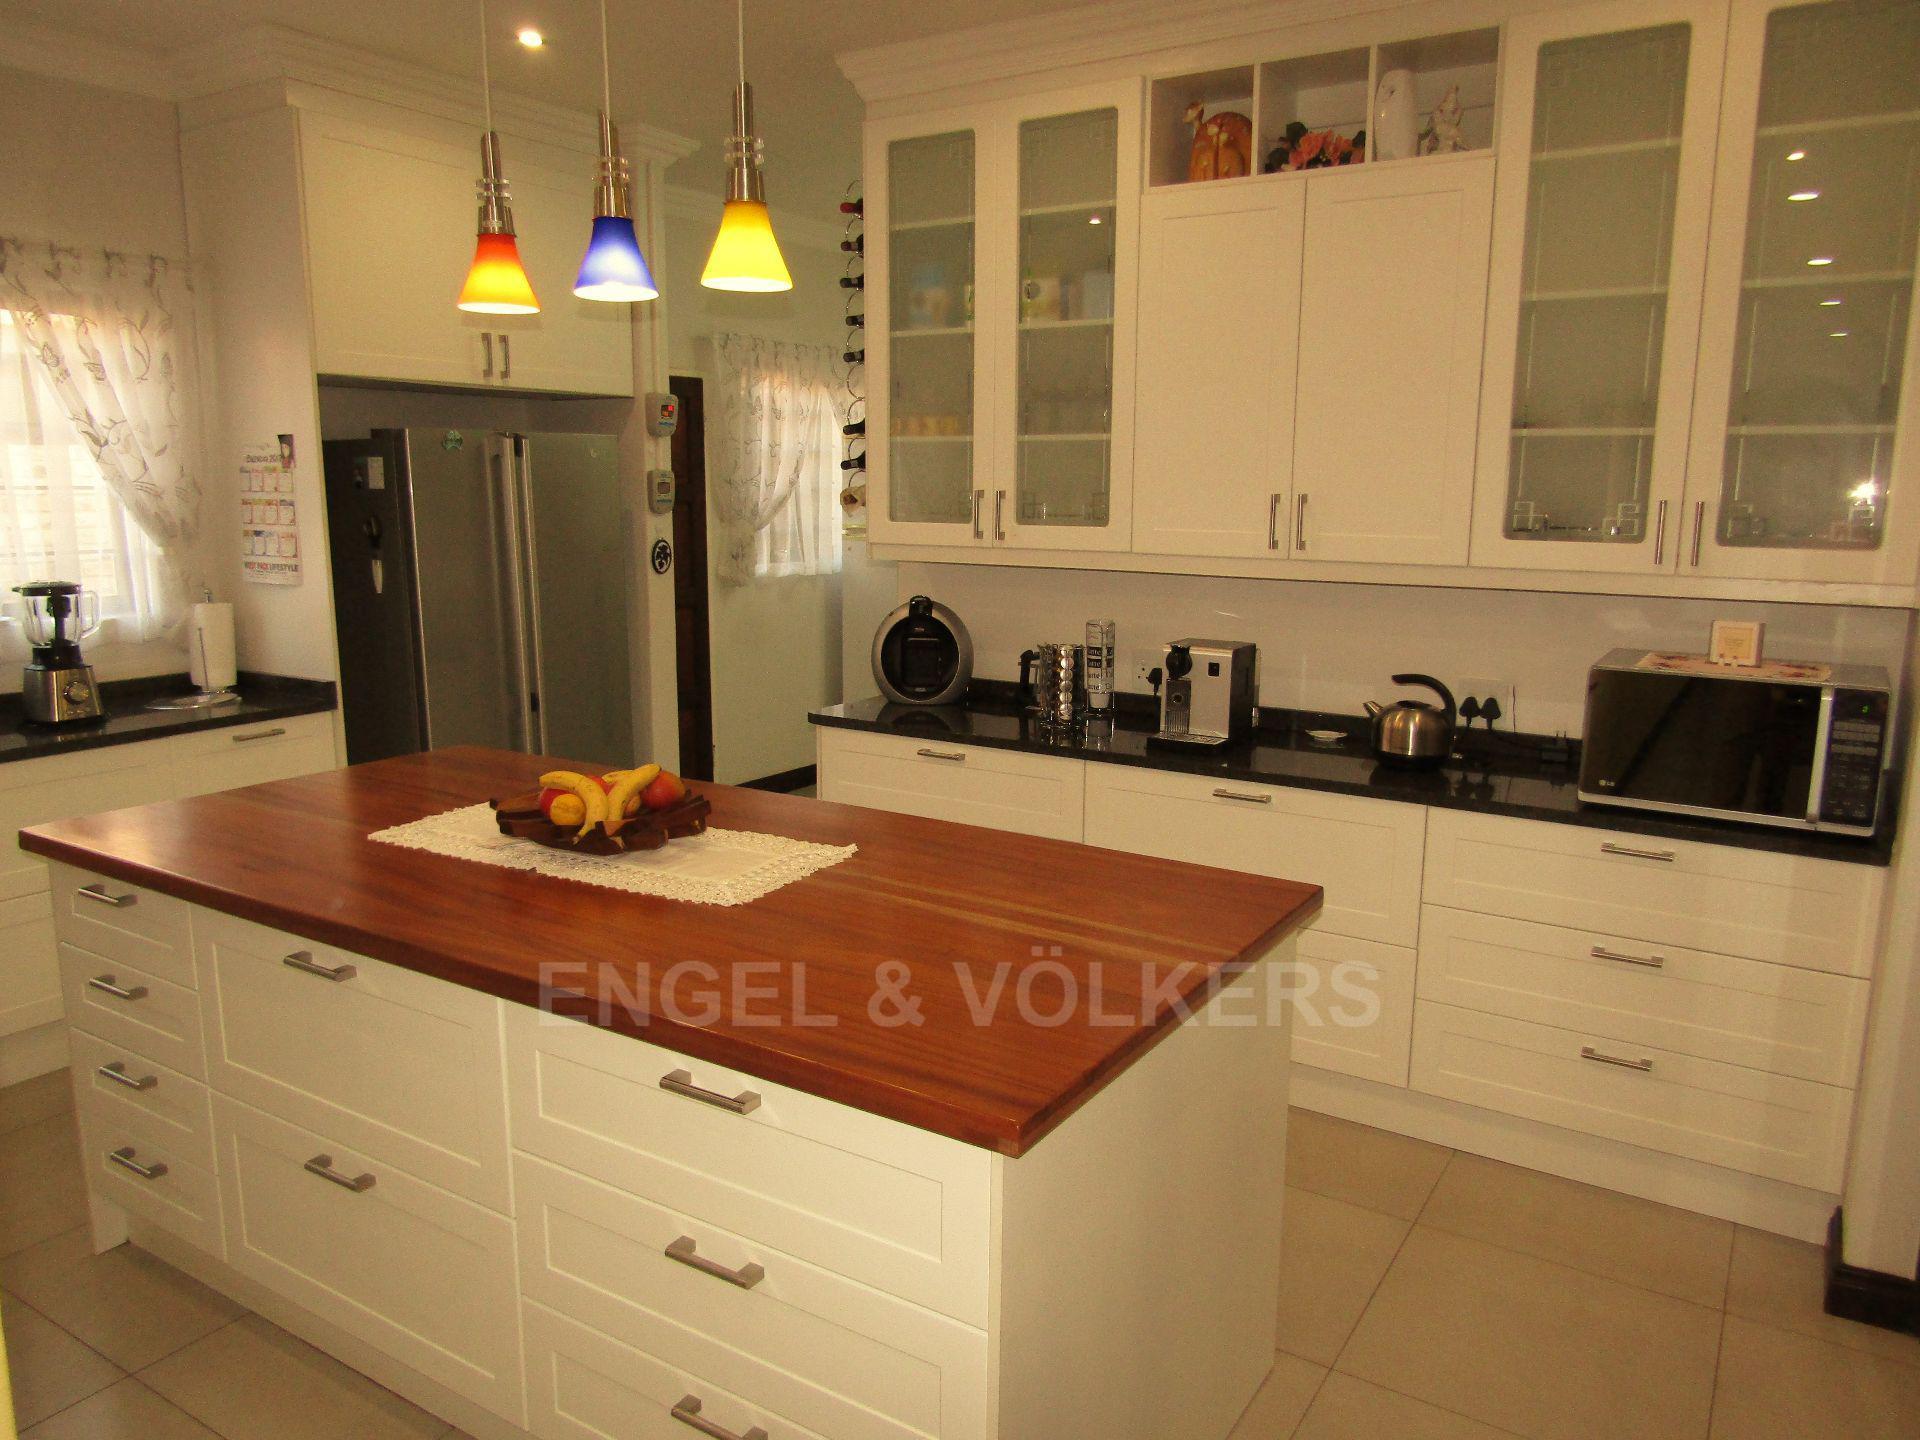 Lifestyle Estate property for sale. Ref No: 13458759. Picture no 6